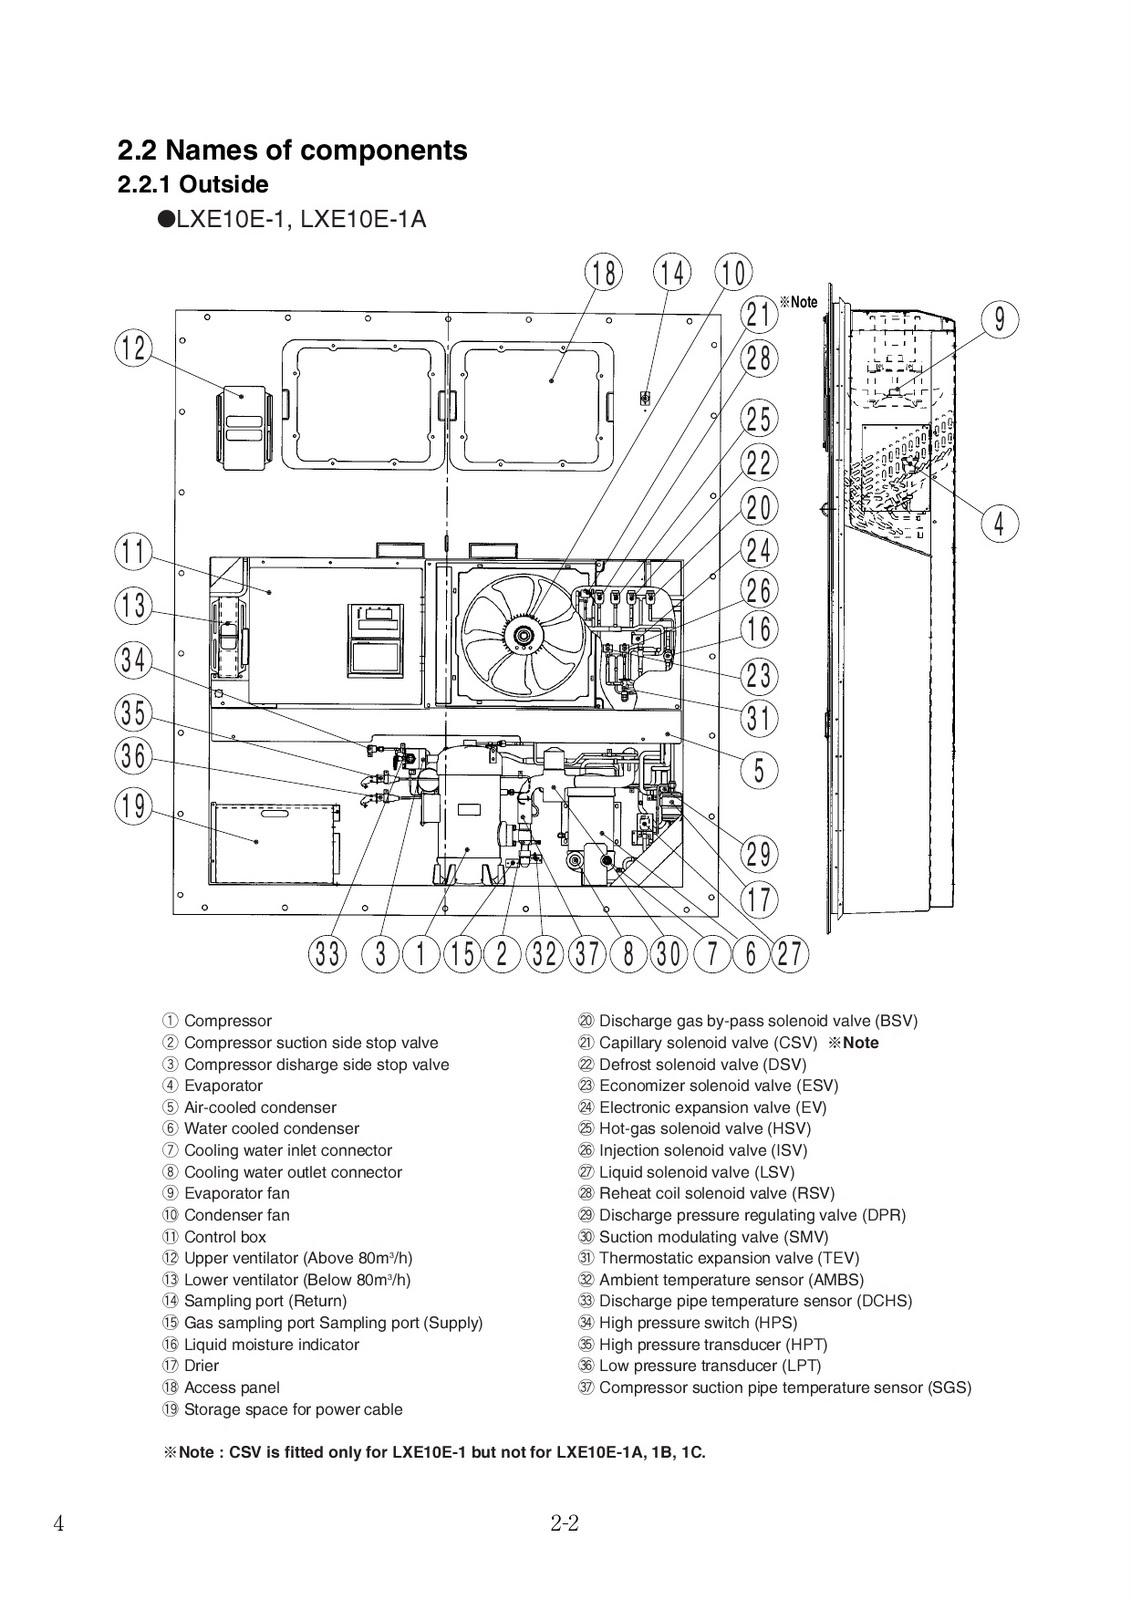 DAIKIN LXE10E REEFER MACHINERY ELEPHANT CHART FOR SURVEYOR